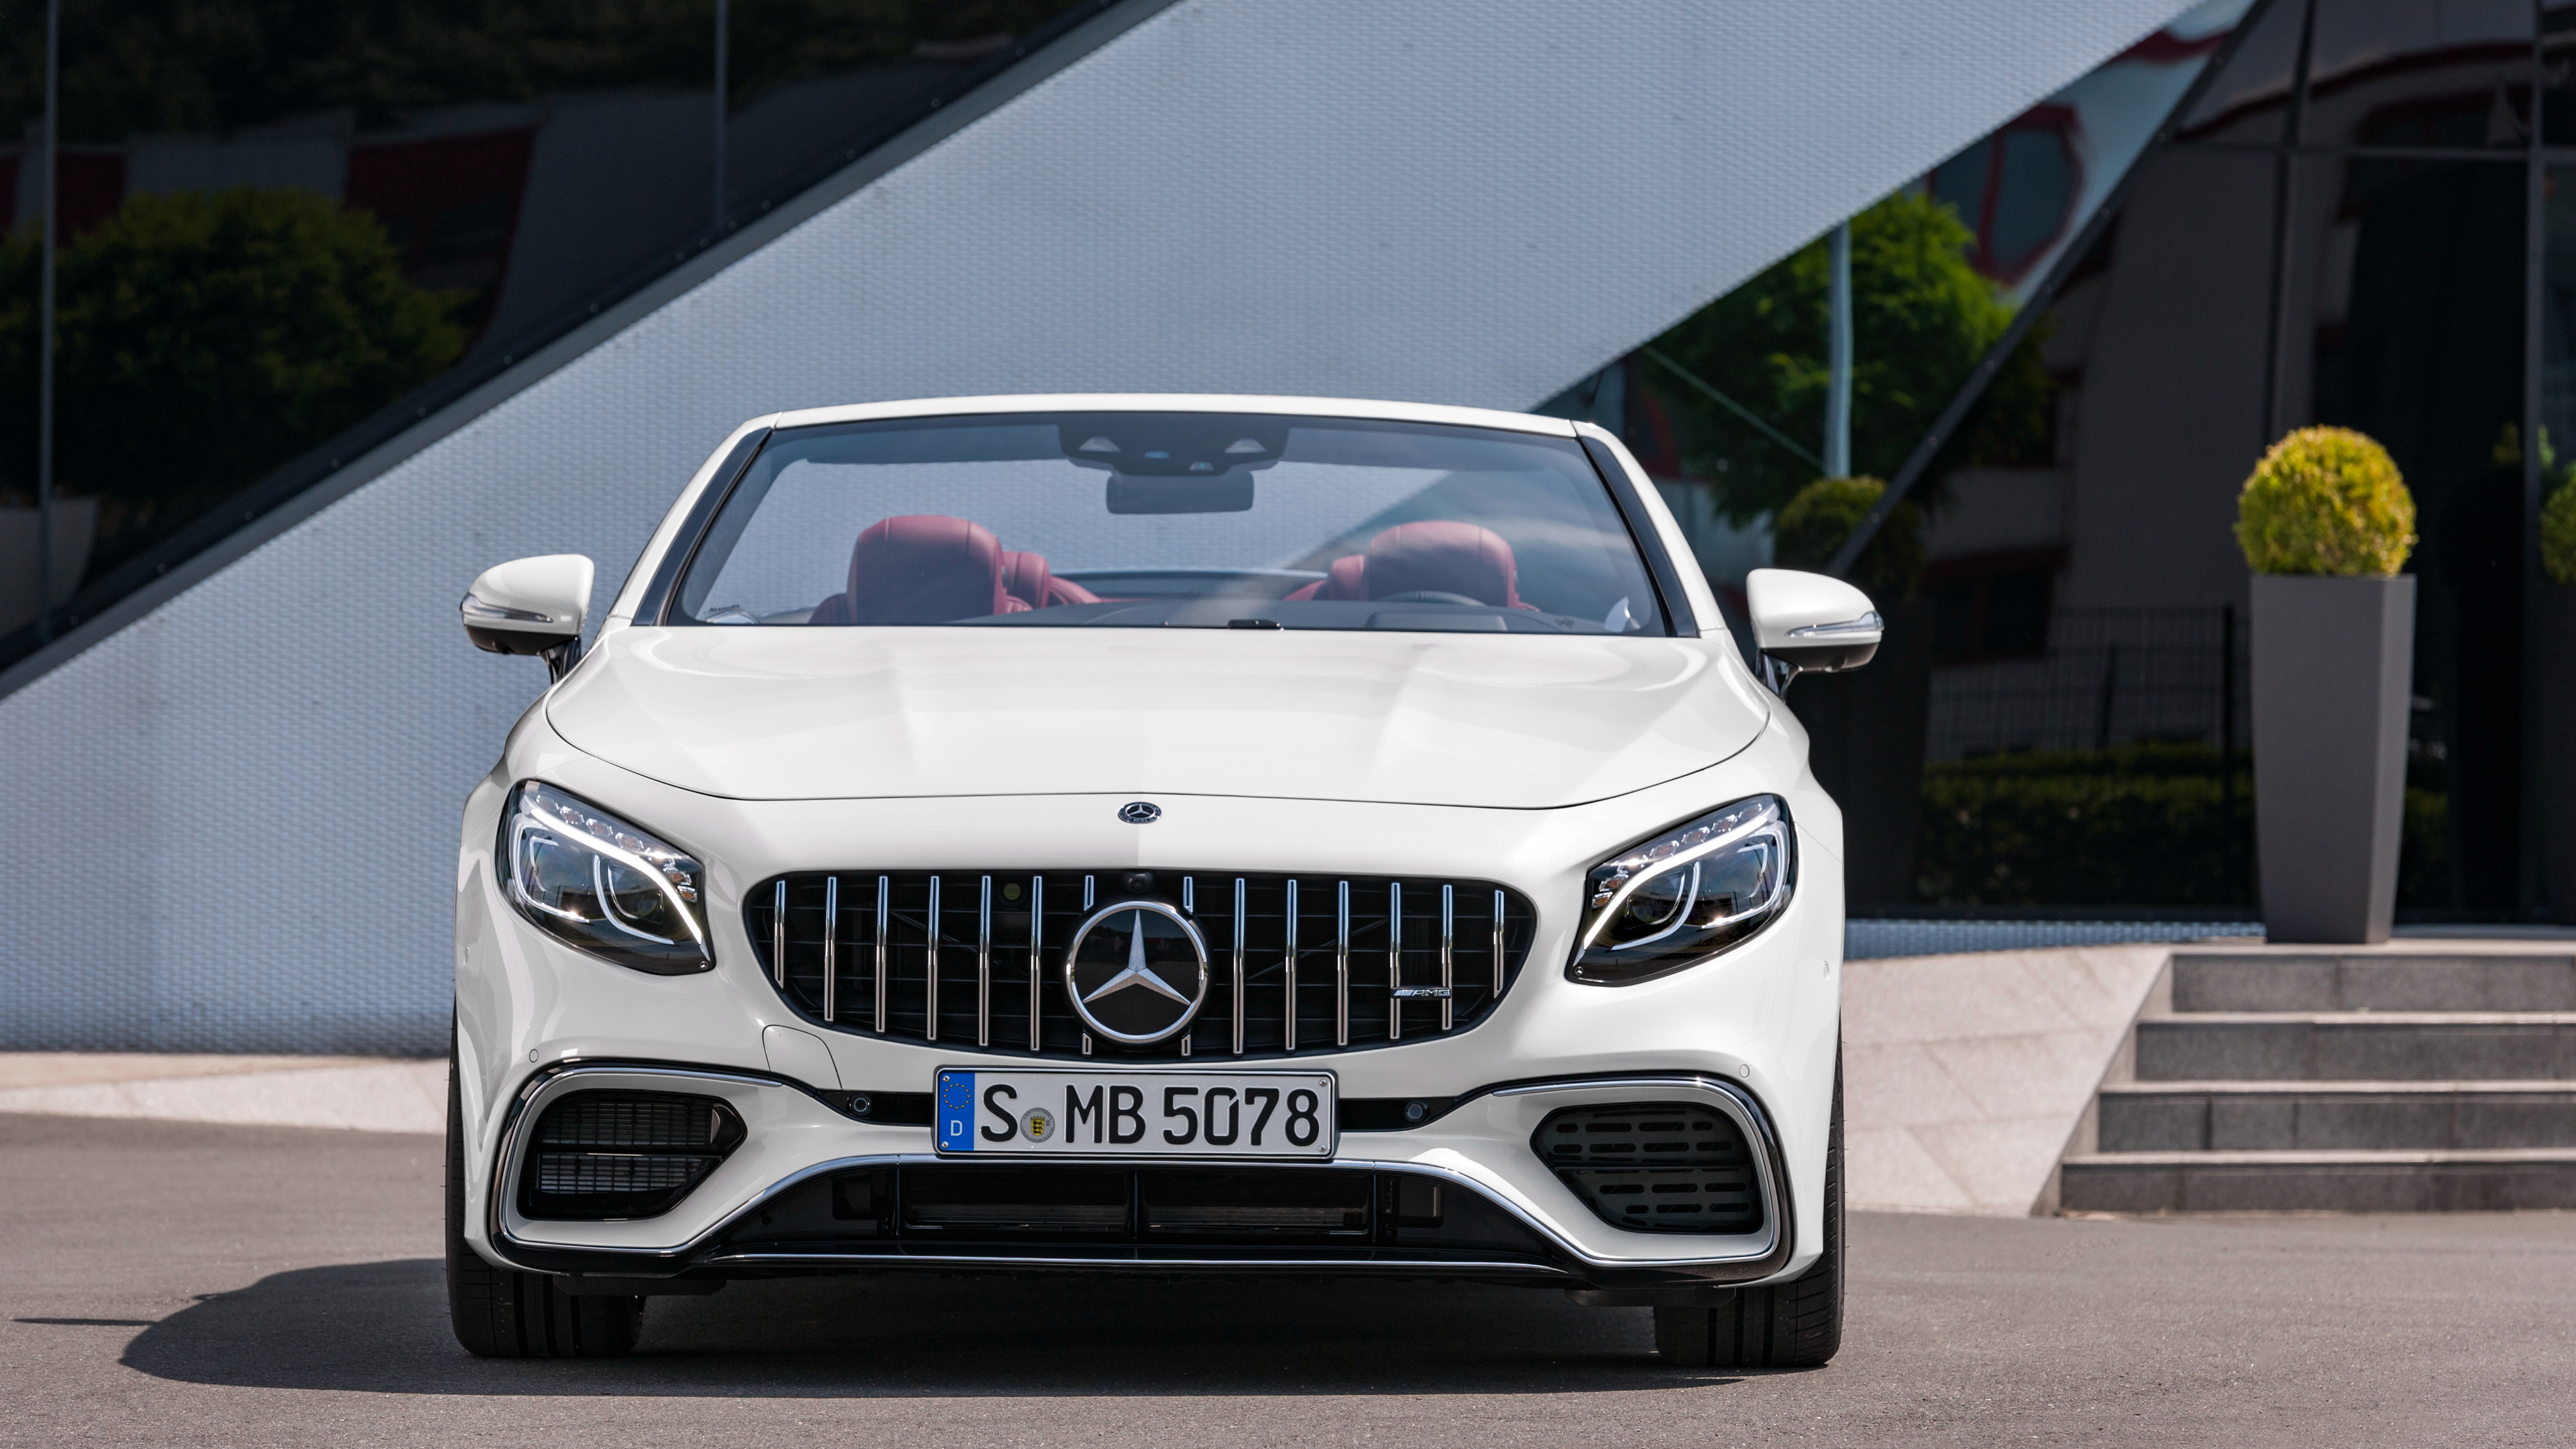 2017 Mercedes Amg S 63 4matic Cabriolet 4k Wallpaper Hd Car Wallpapers Id 8442